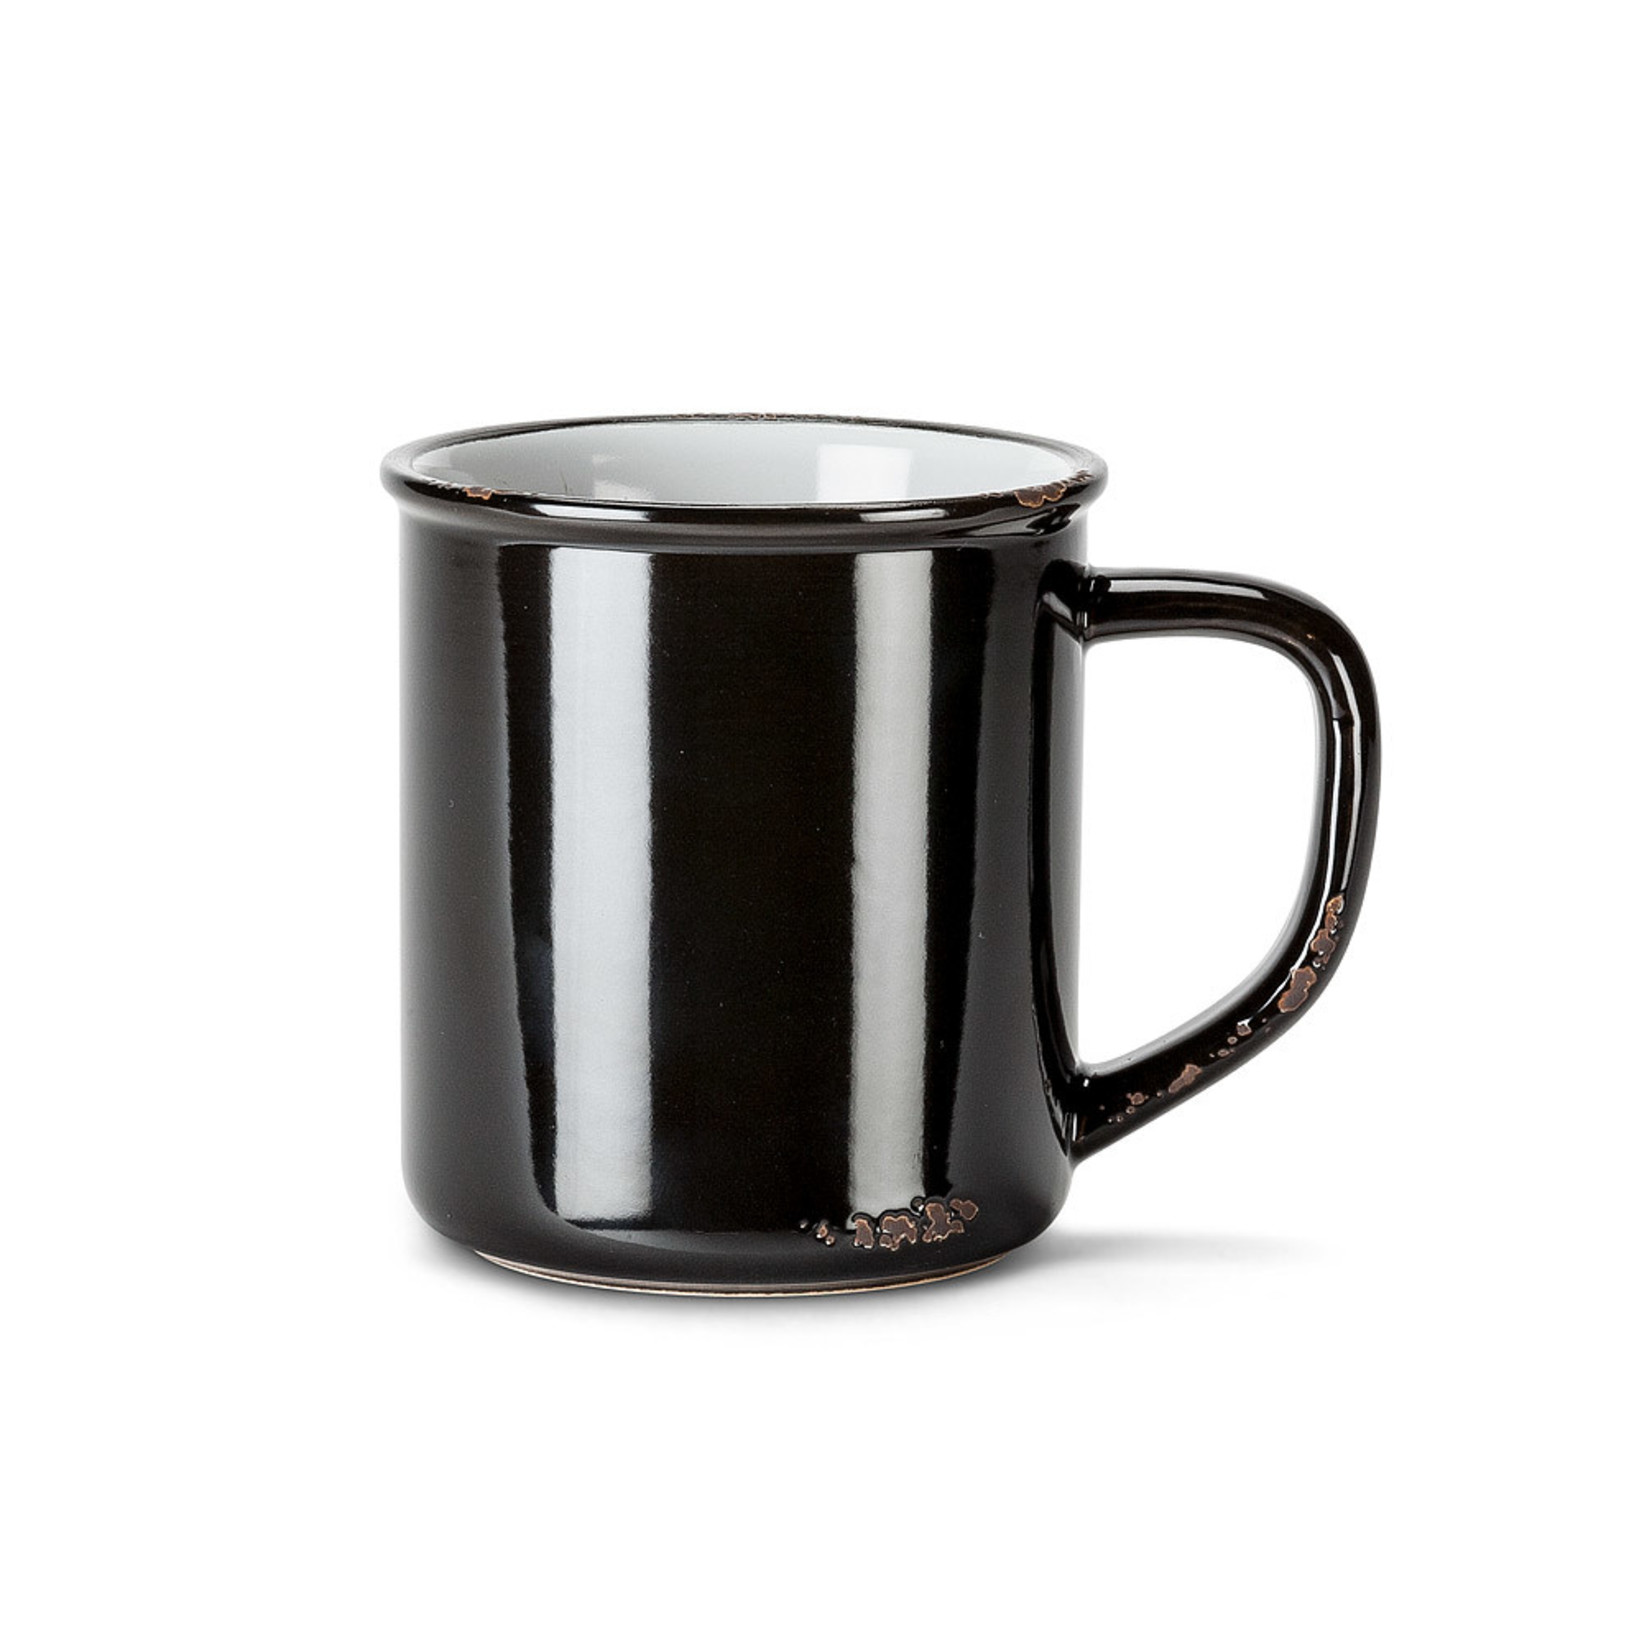 Mug - Enamel Look 14 oz. Stoneware